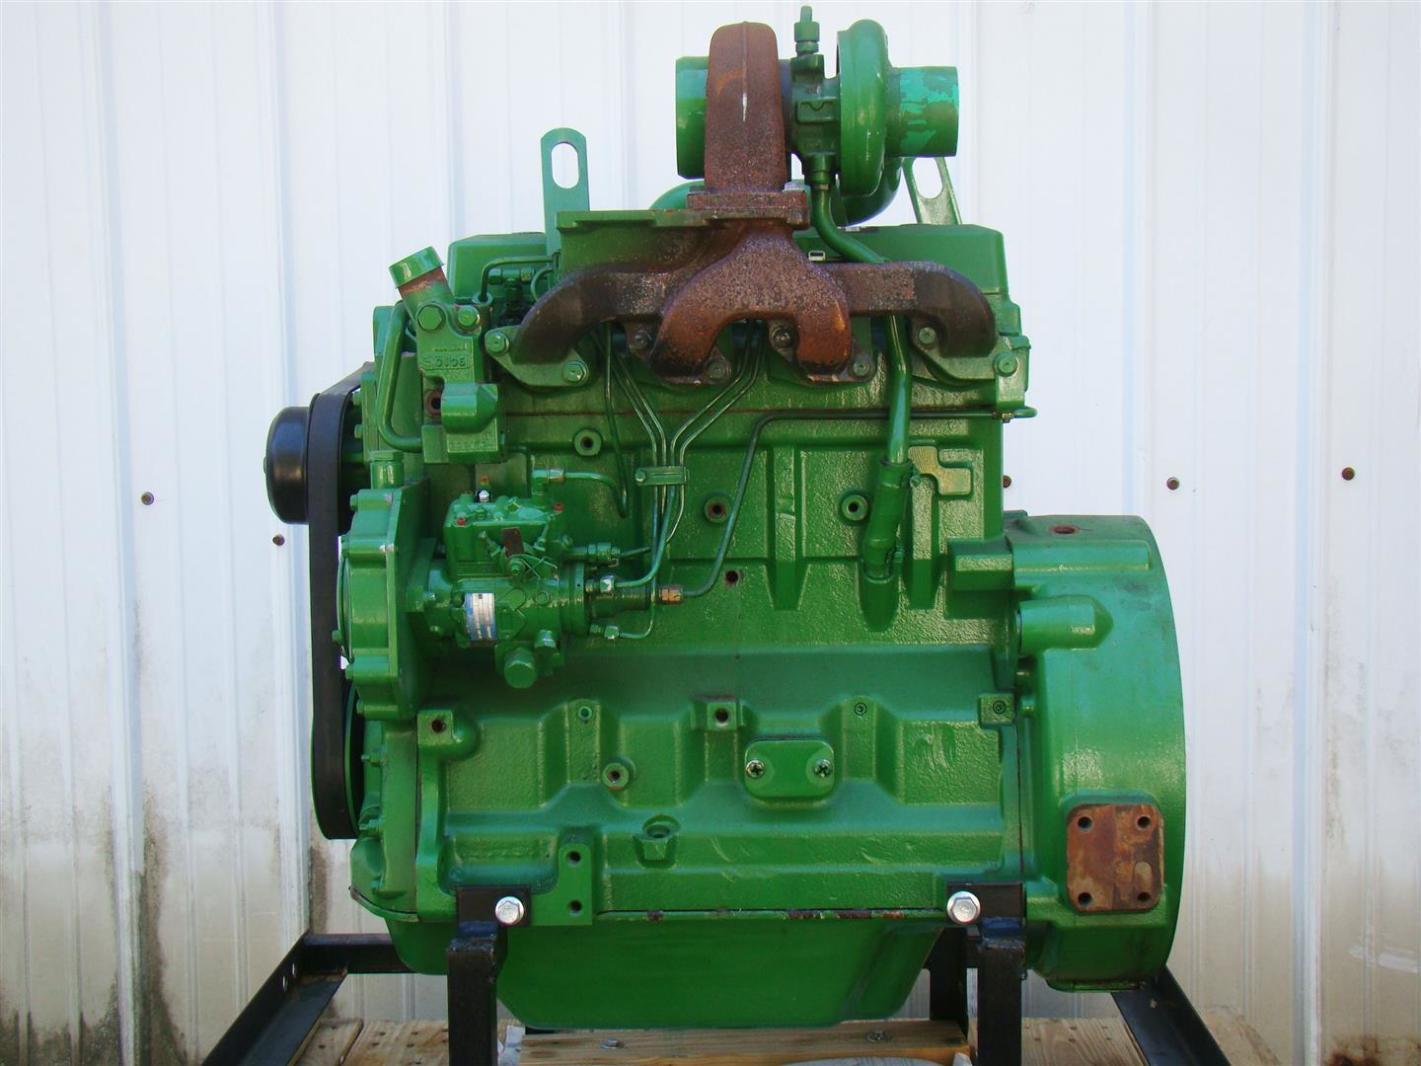 John Deere Diesel Engine 4.5L Turbocharged 4-cylinder 96-23579 4045TF151 | eBay